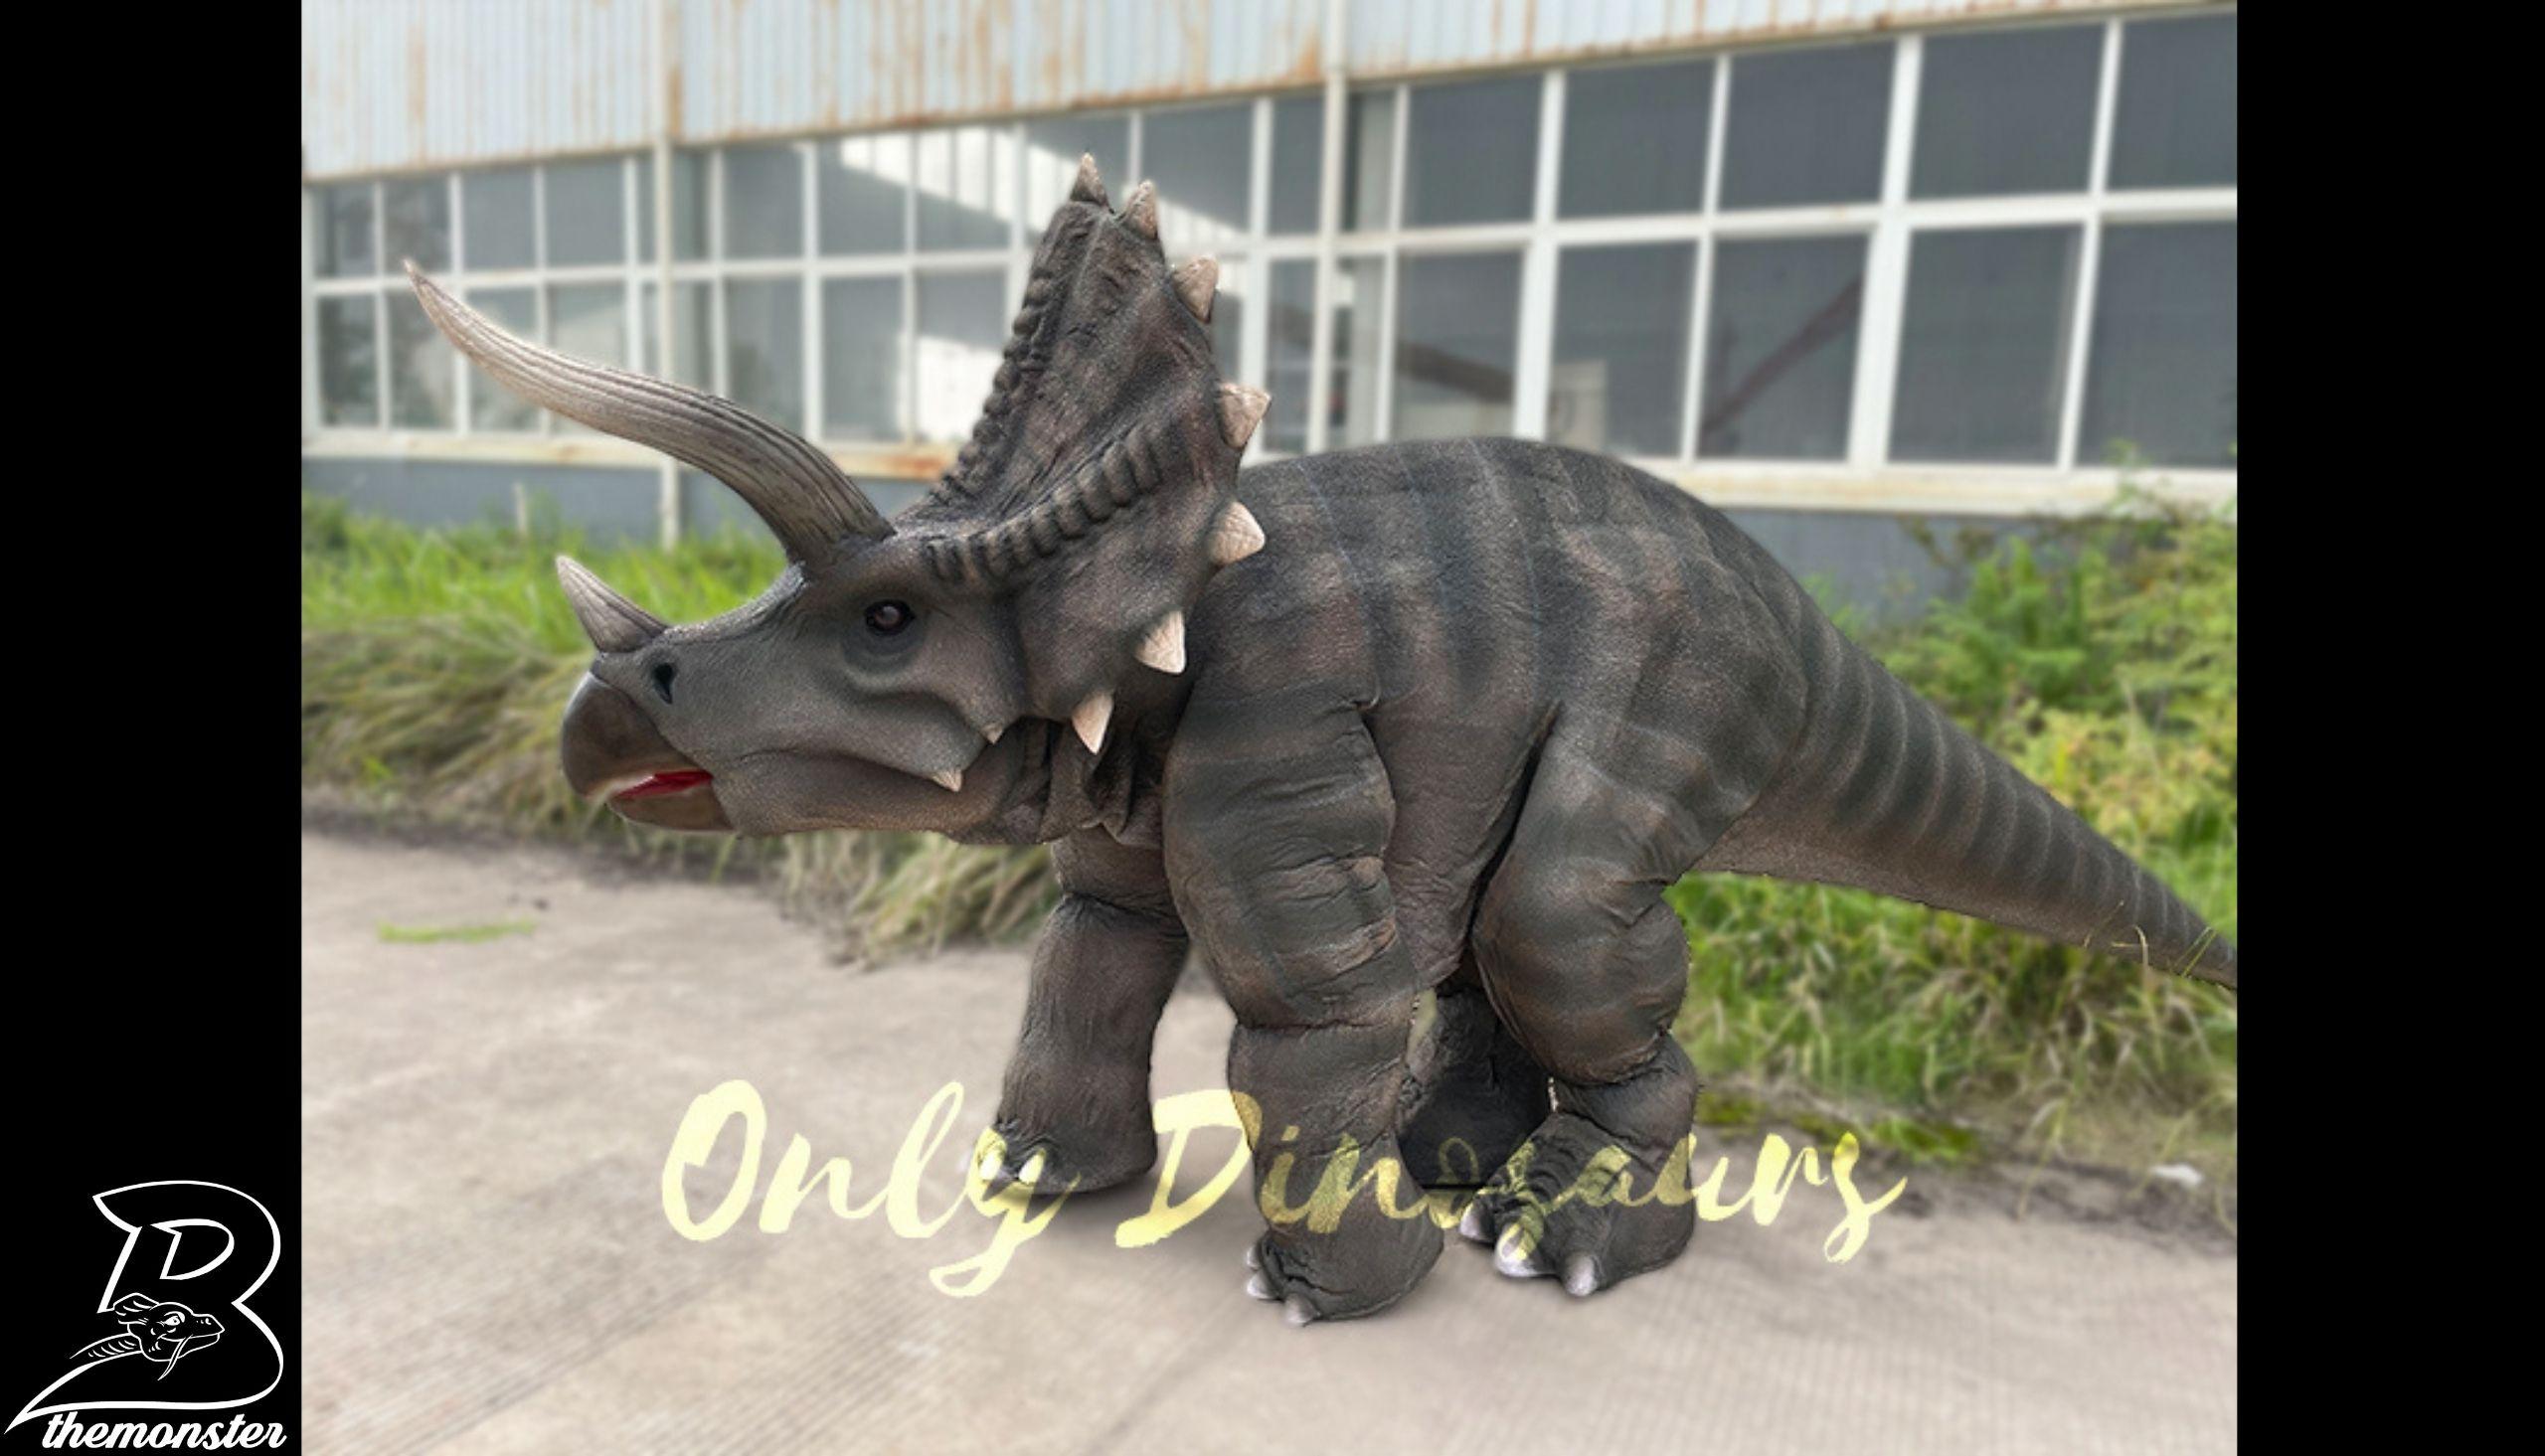 Vivid Single Man Triceratops Dinosaur Costume in vendita sul Bthemonster.com